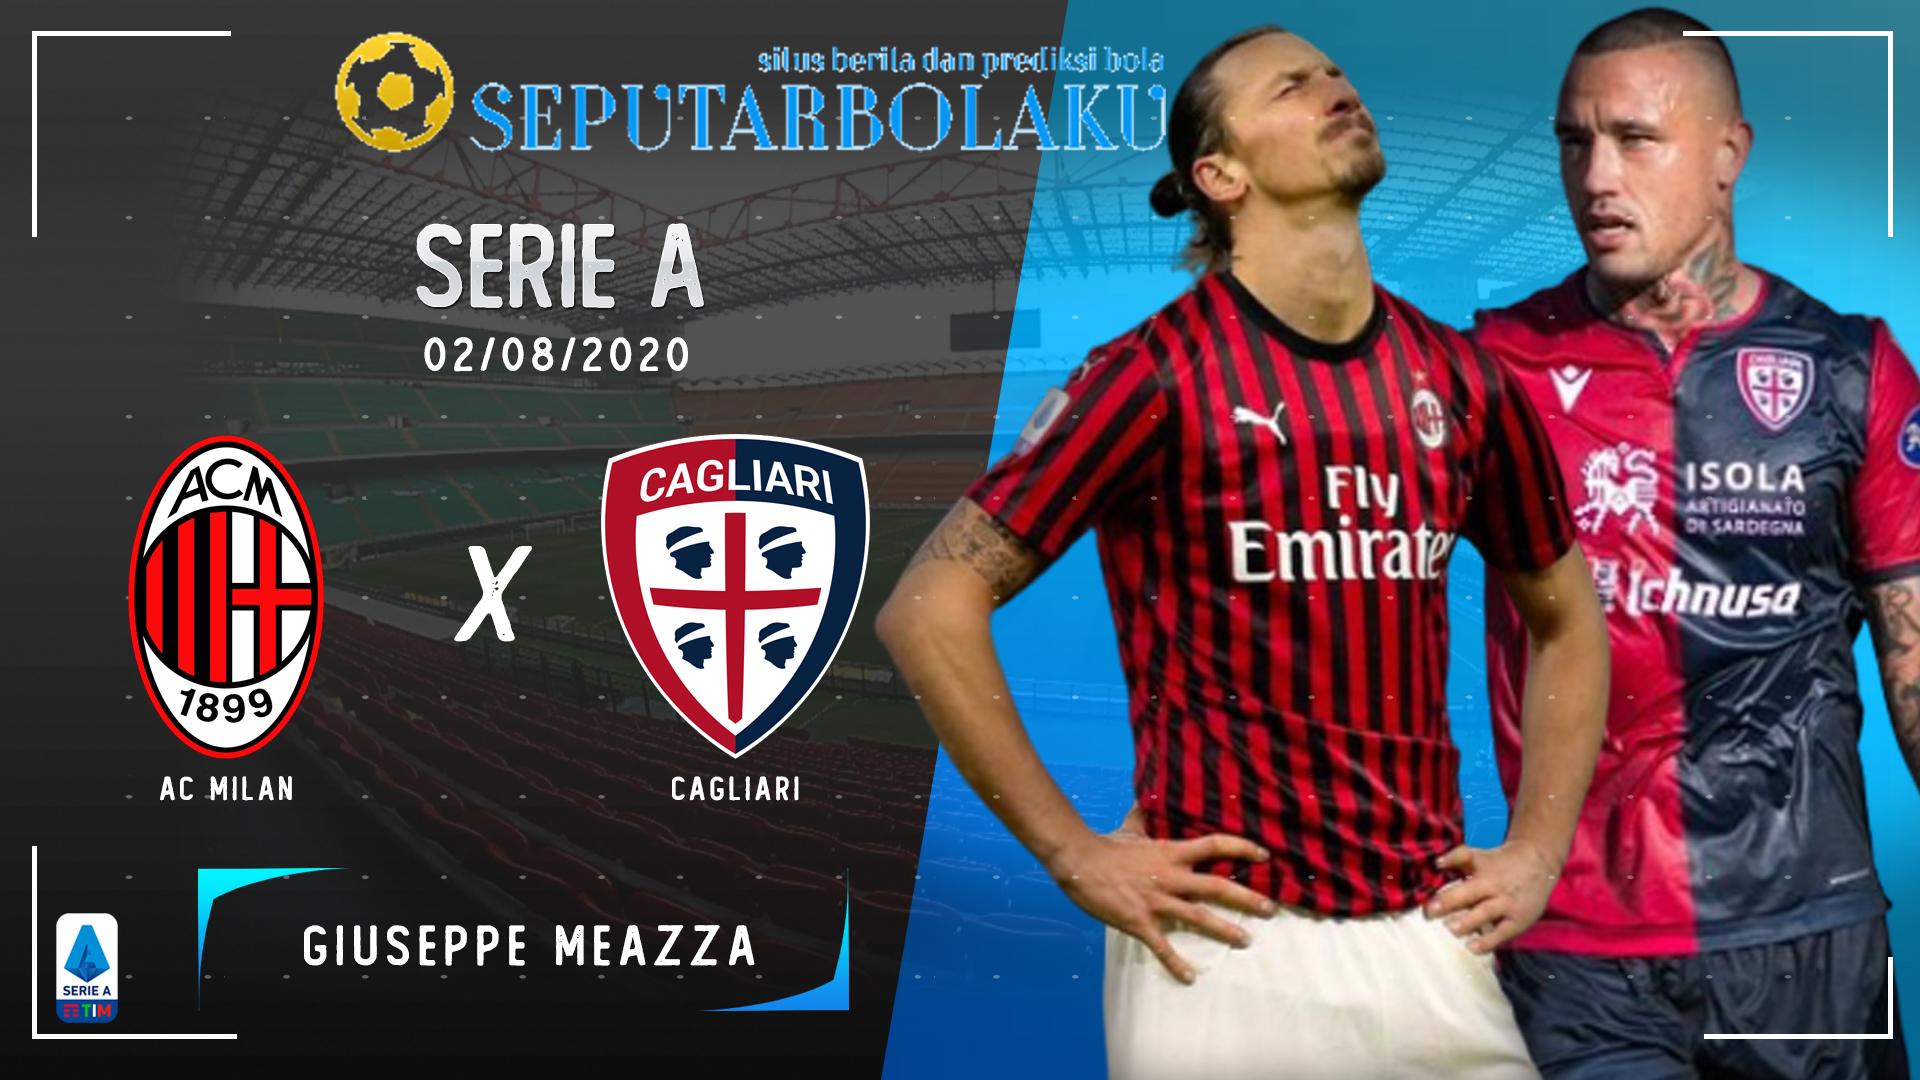 Prediksi Bola AC Milan vs Cagliari 2 Agustus 2020